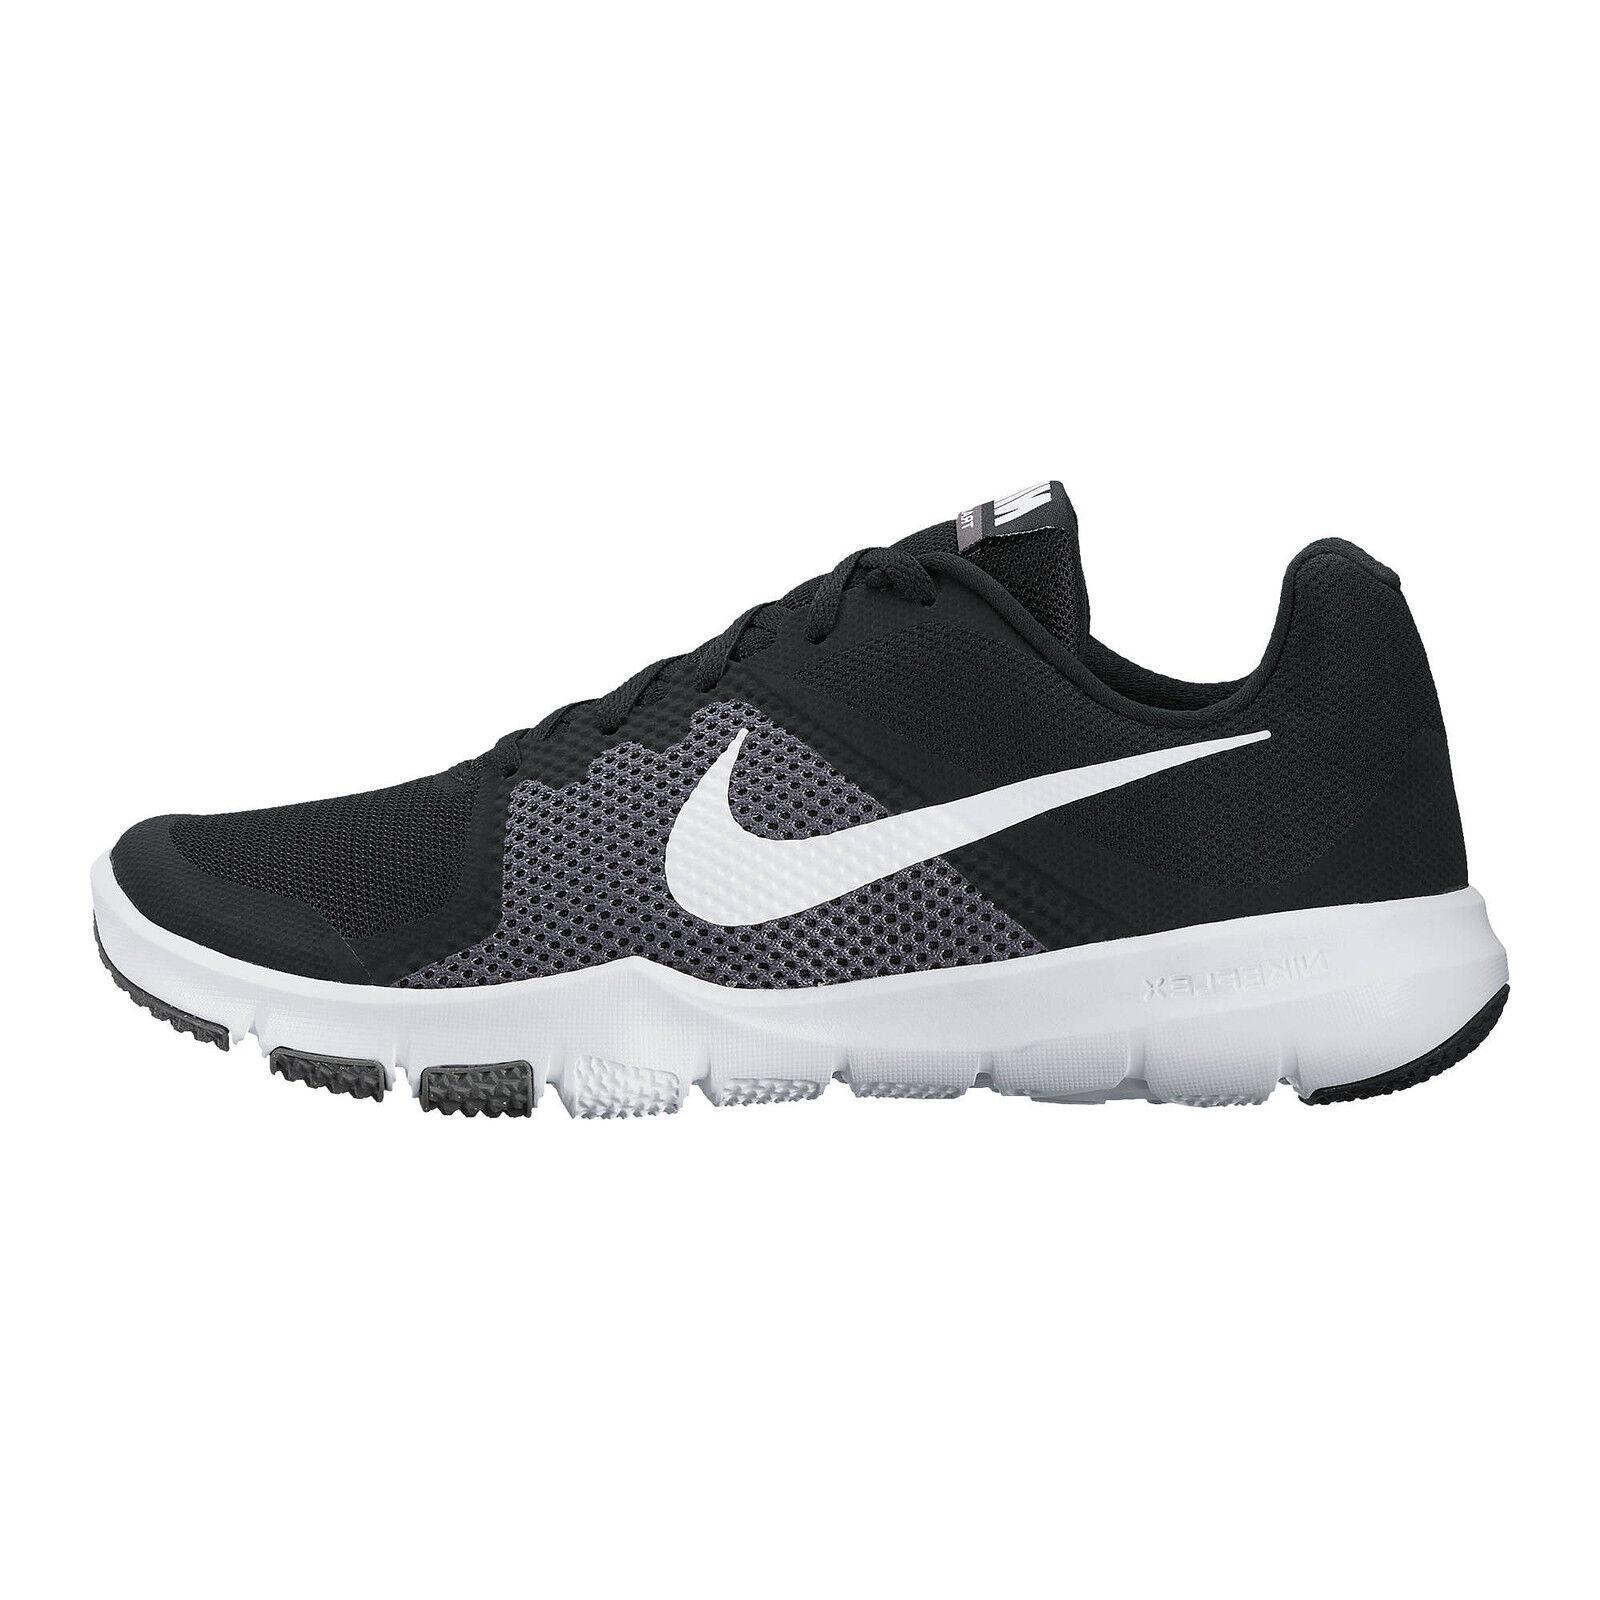 Nike Flex Control 898459 010 Sportschuh Sportschuh Training Lauschuh Sportschuh 010 ab38e3